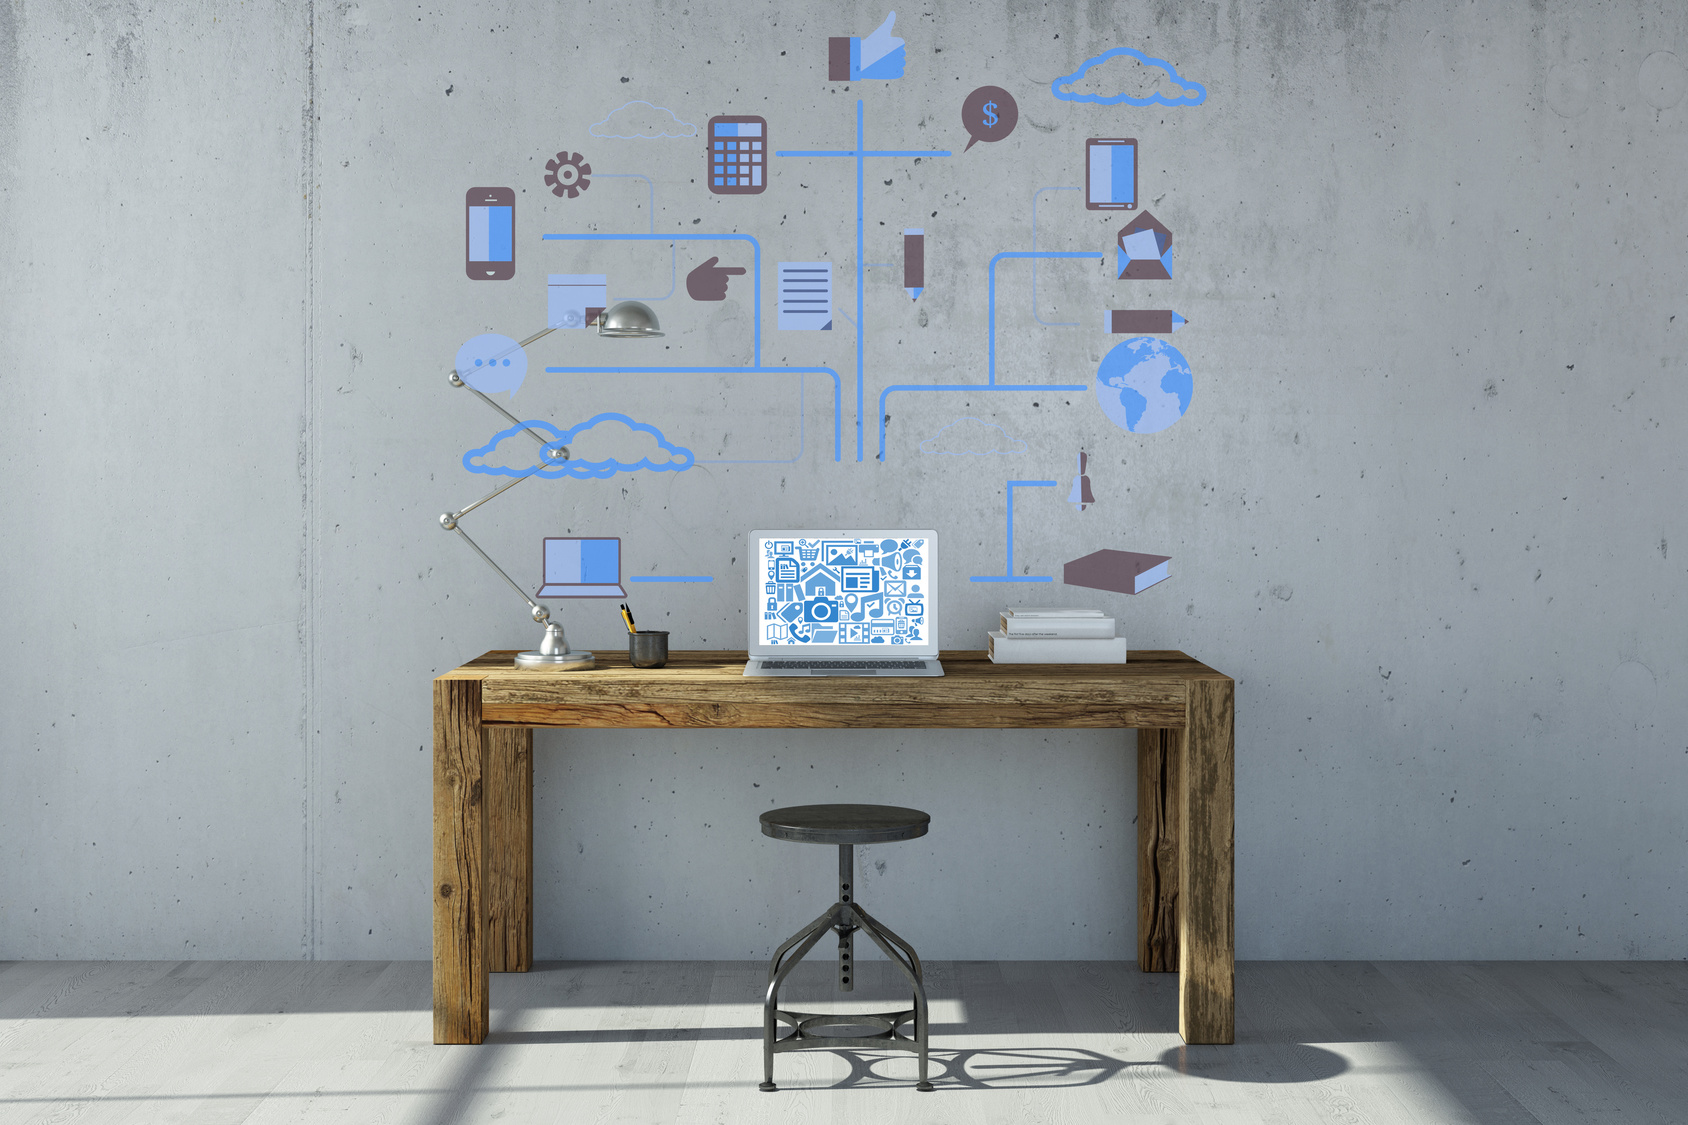 bmw deutschland praktikum. Black Bedroom Furniture Sets. Home Design Ideas